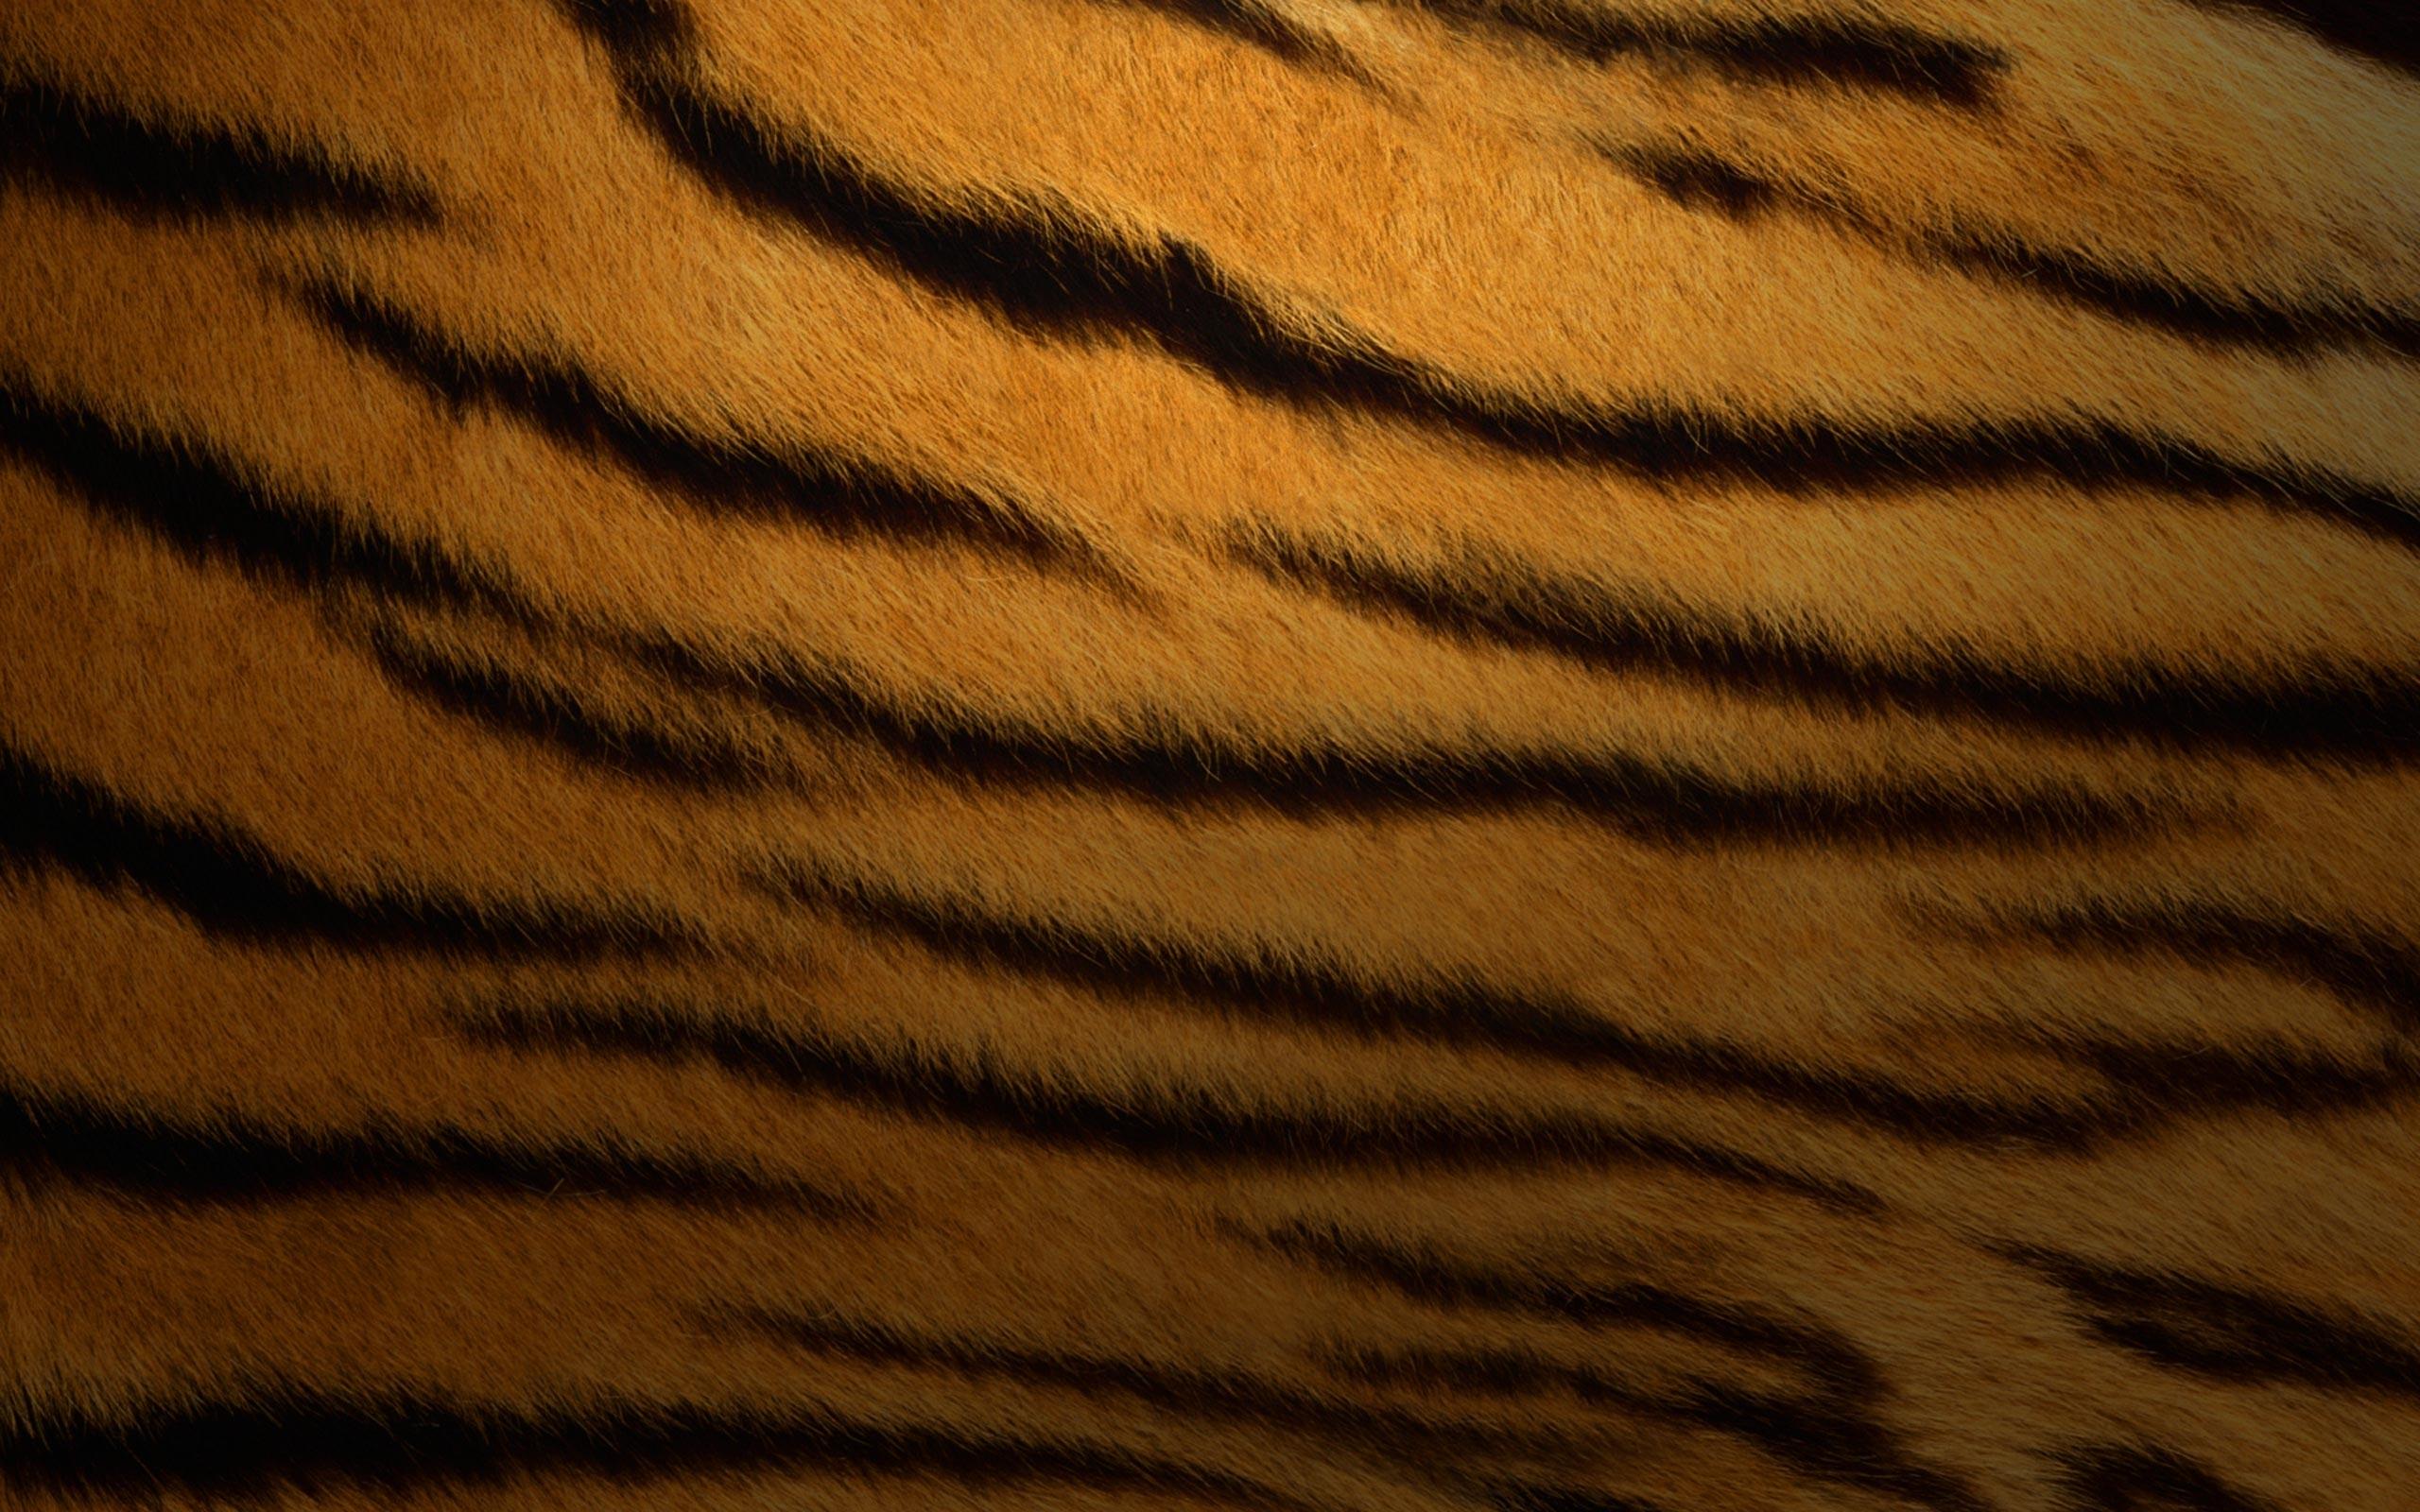 mac os x 10.4 tiger | ars technica